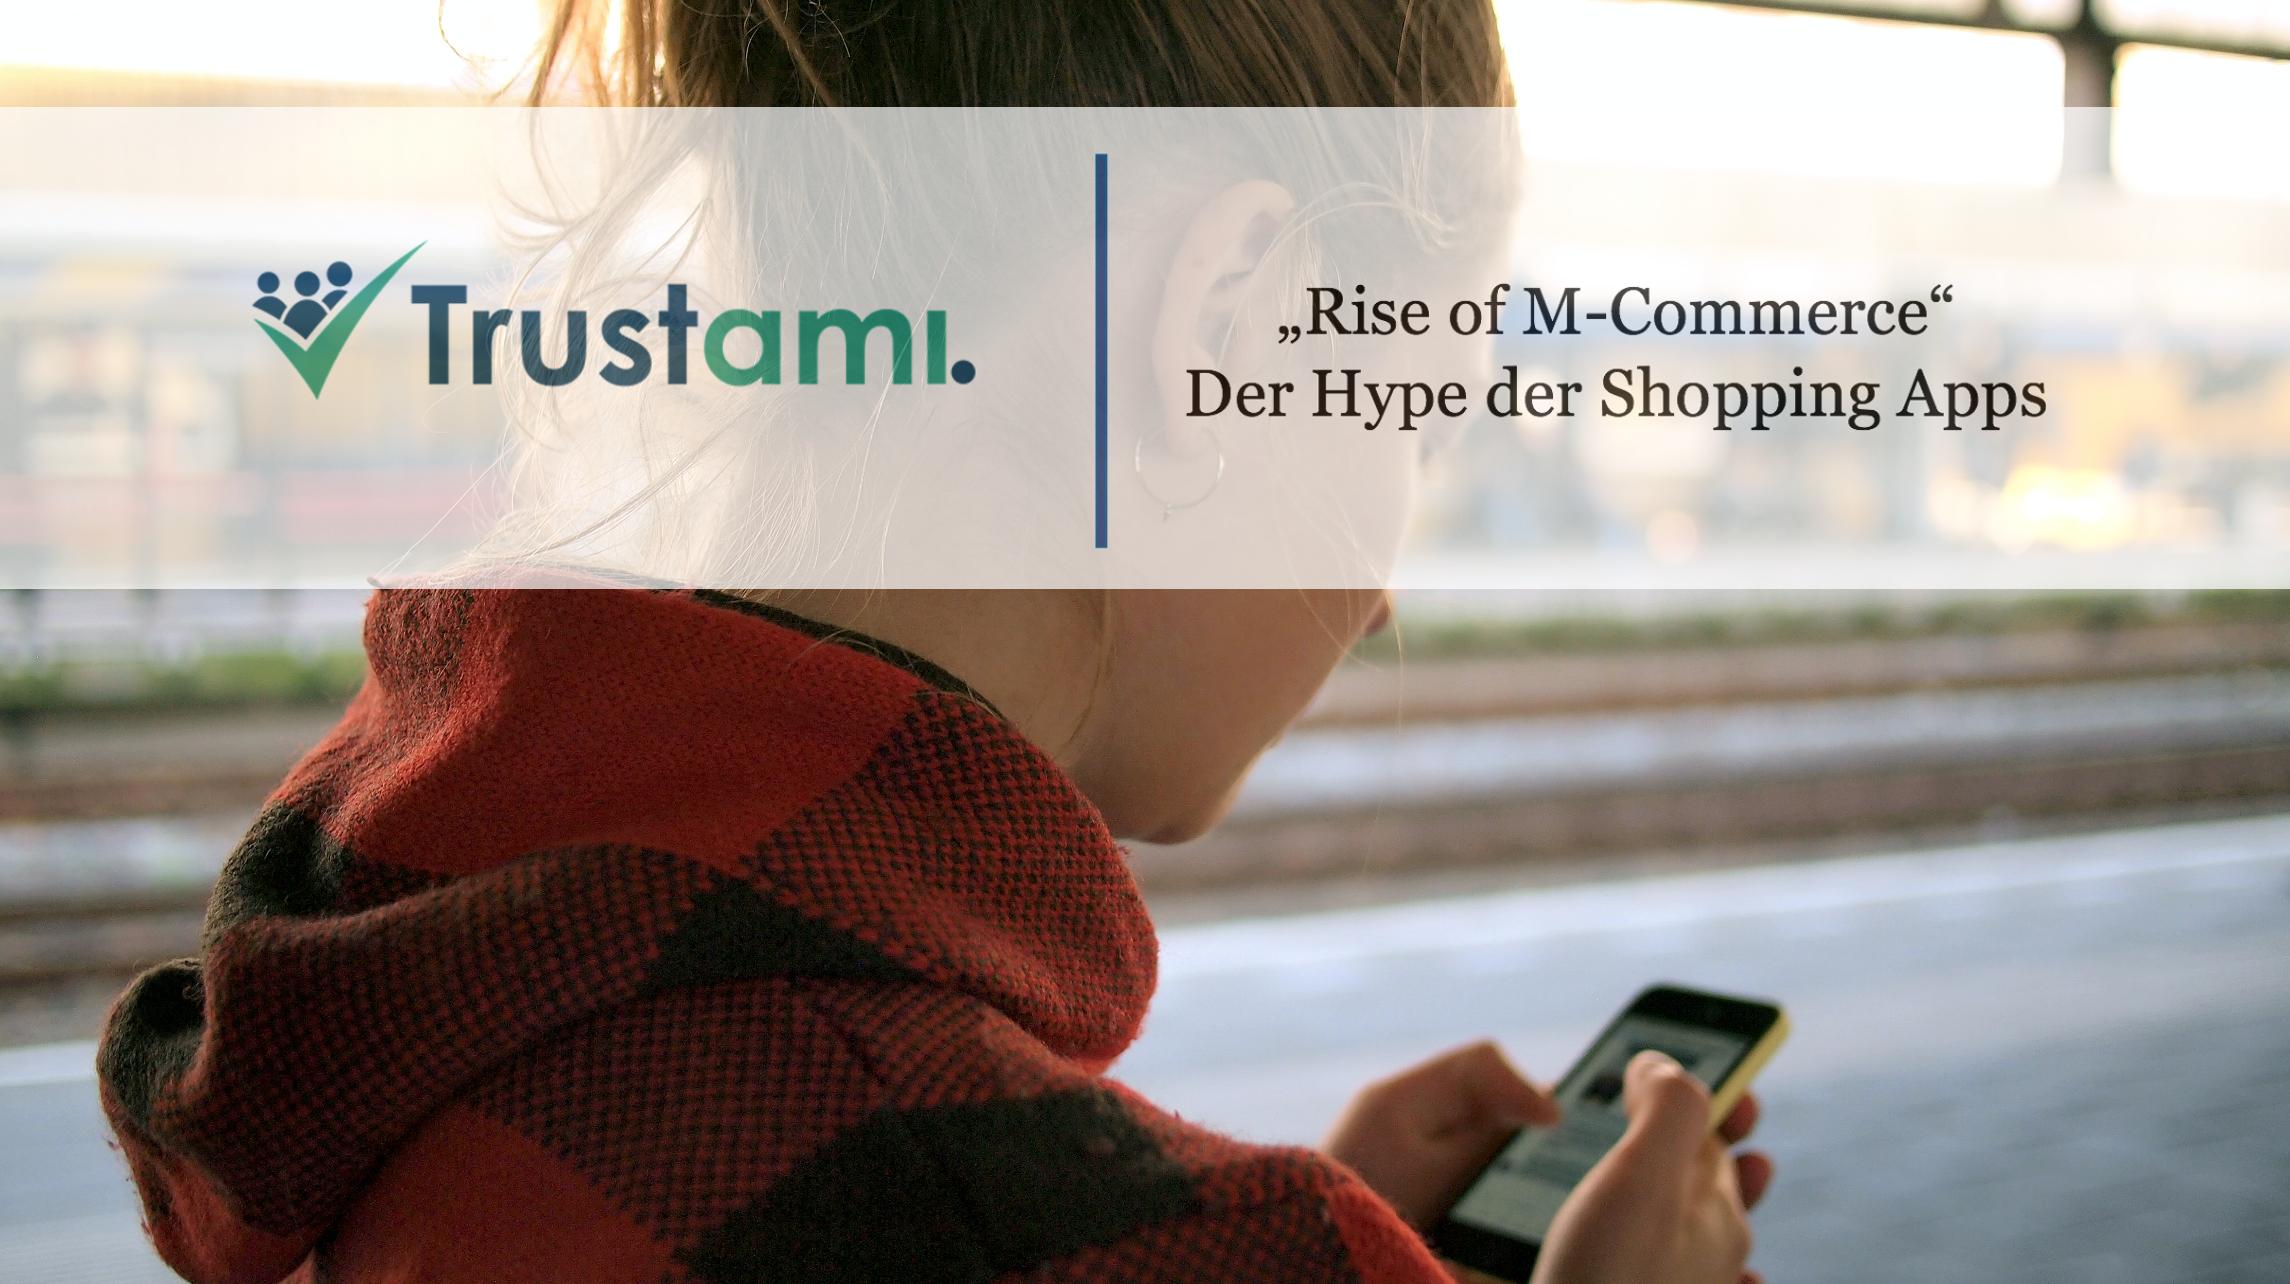 Rise of M-Commerce